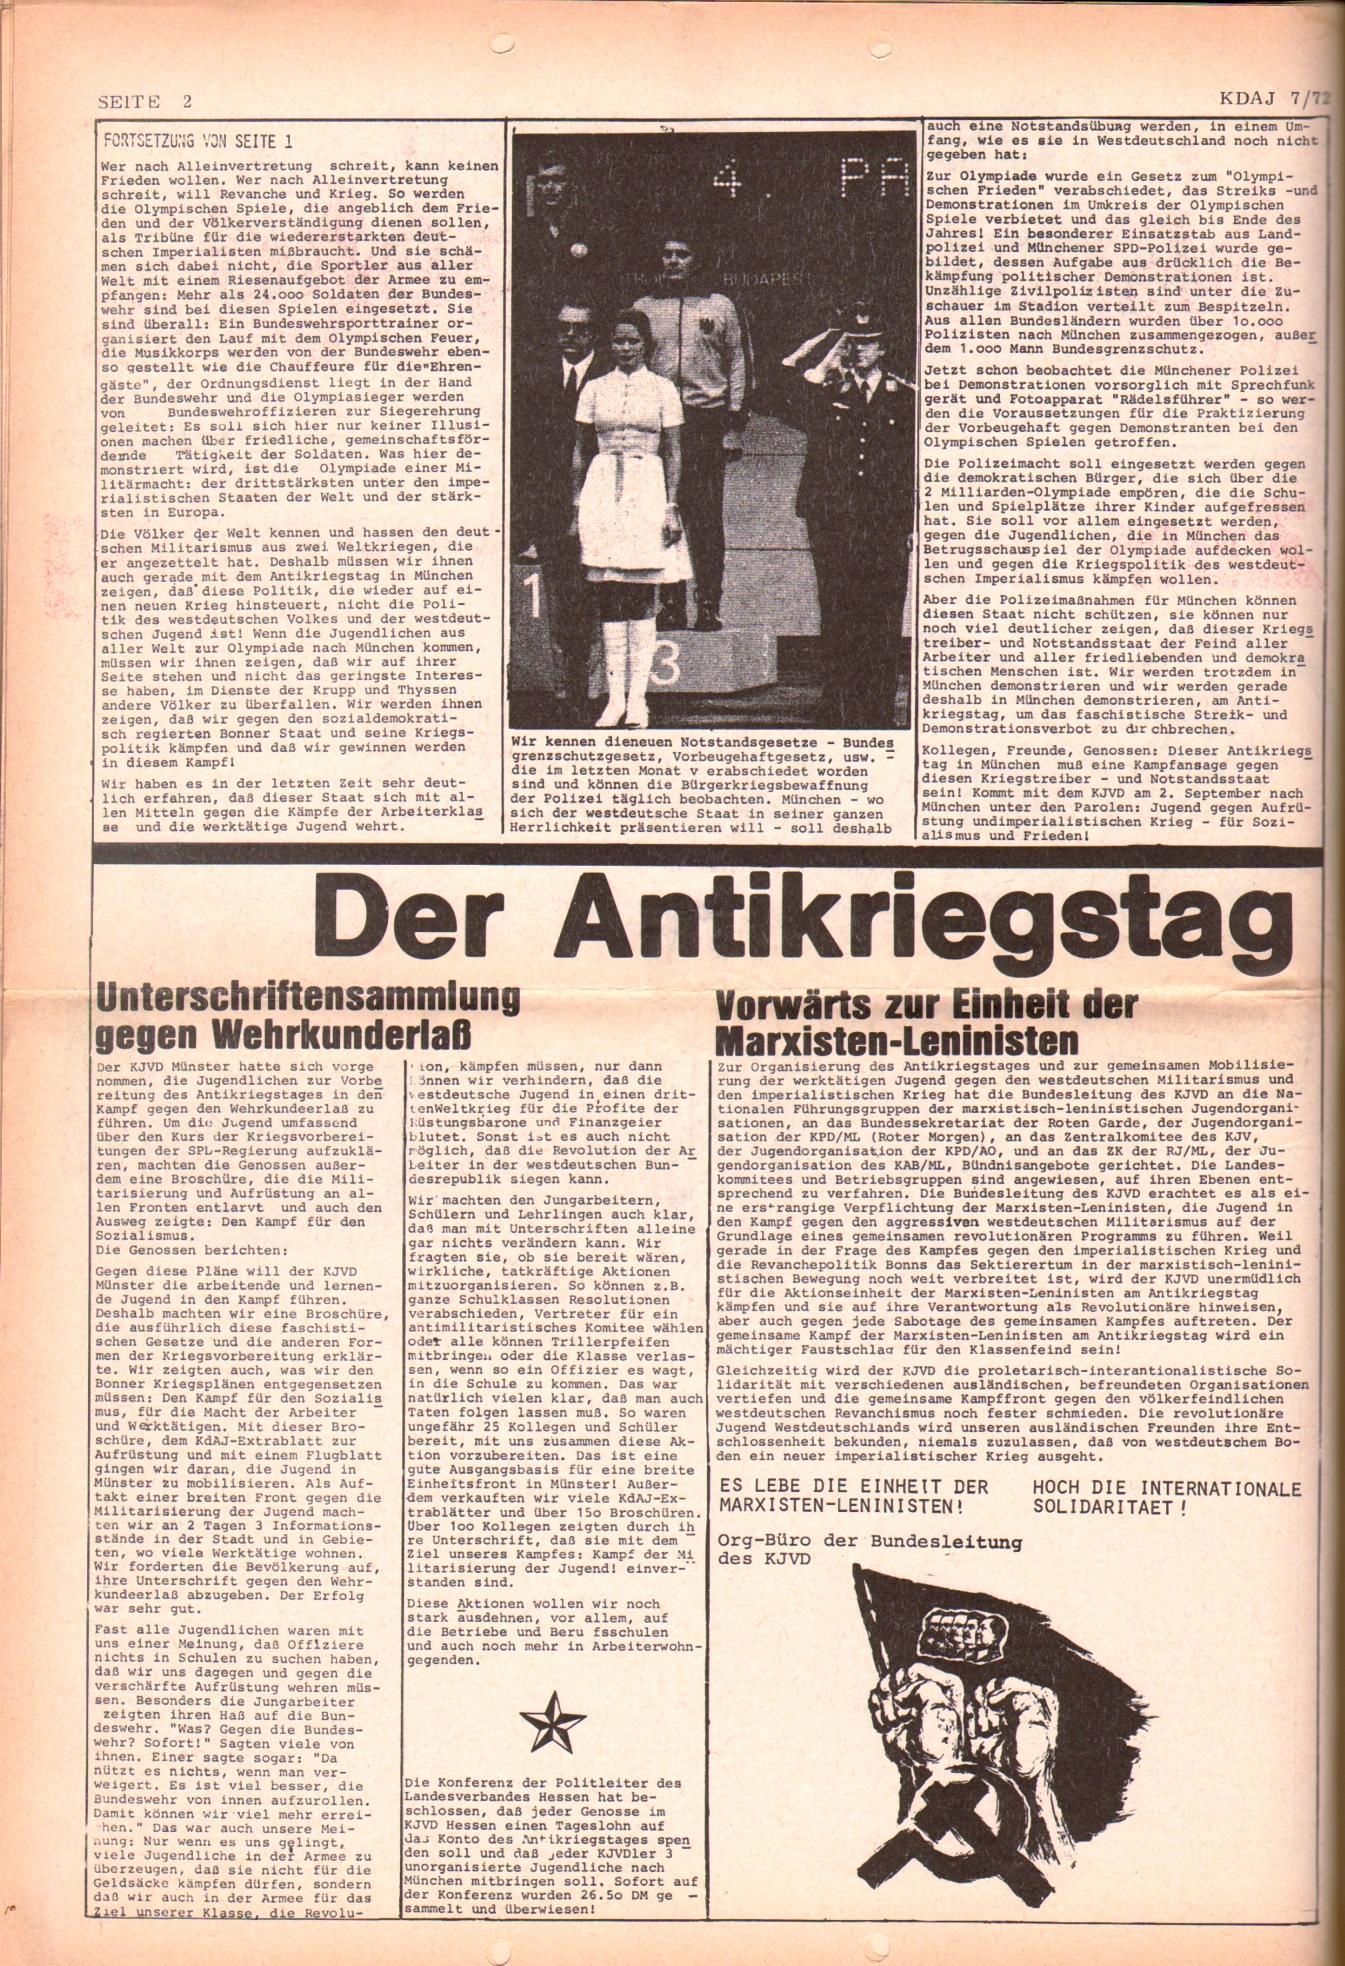 KDAJ, 3. Jg., August 1972, Nr. 7, Seite 2